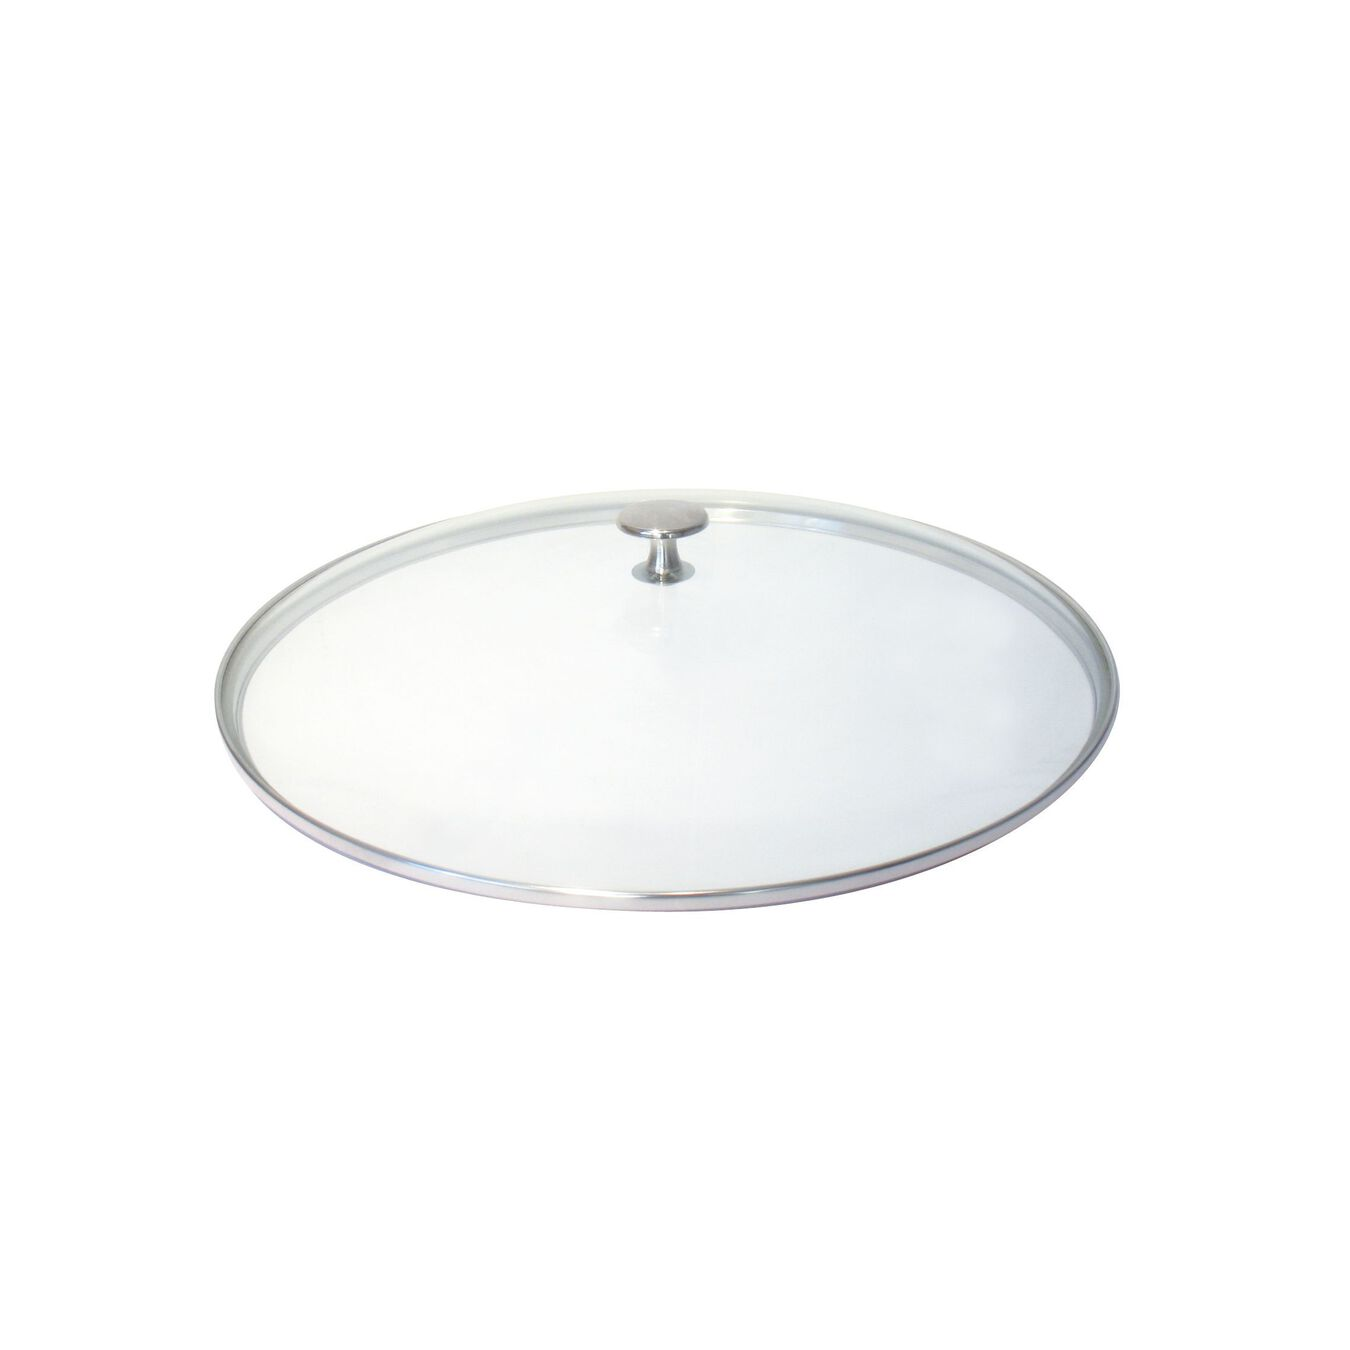 Deckel, 30 cm | rund | Glas | Transparent,,large 1